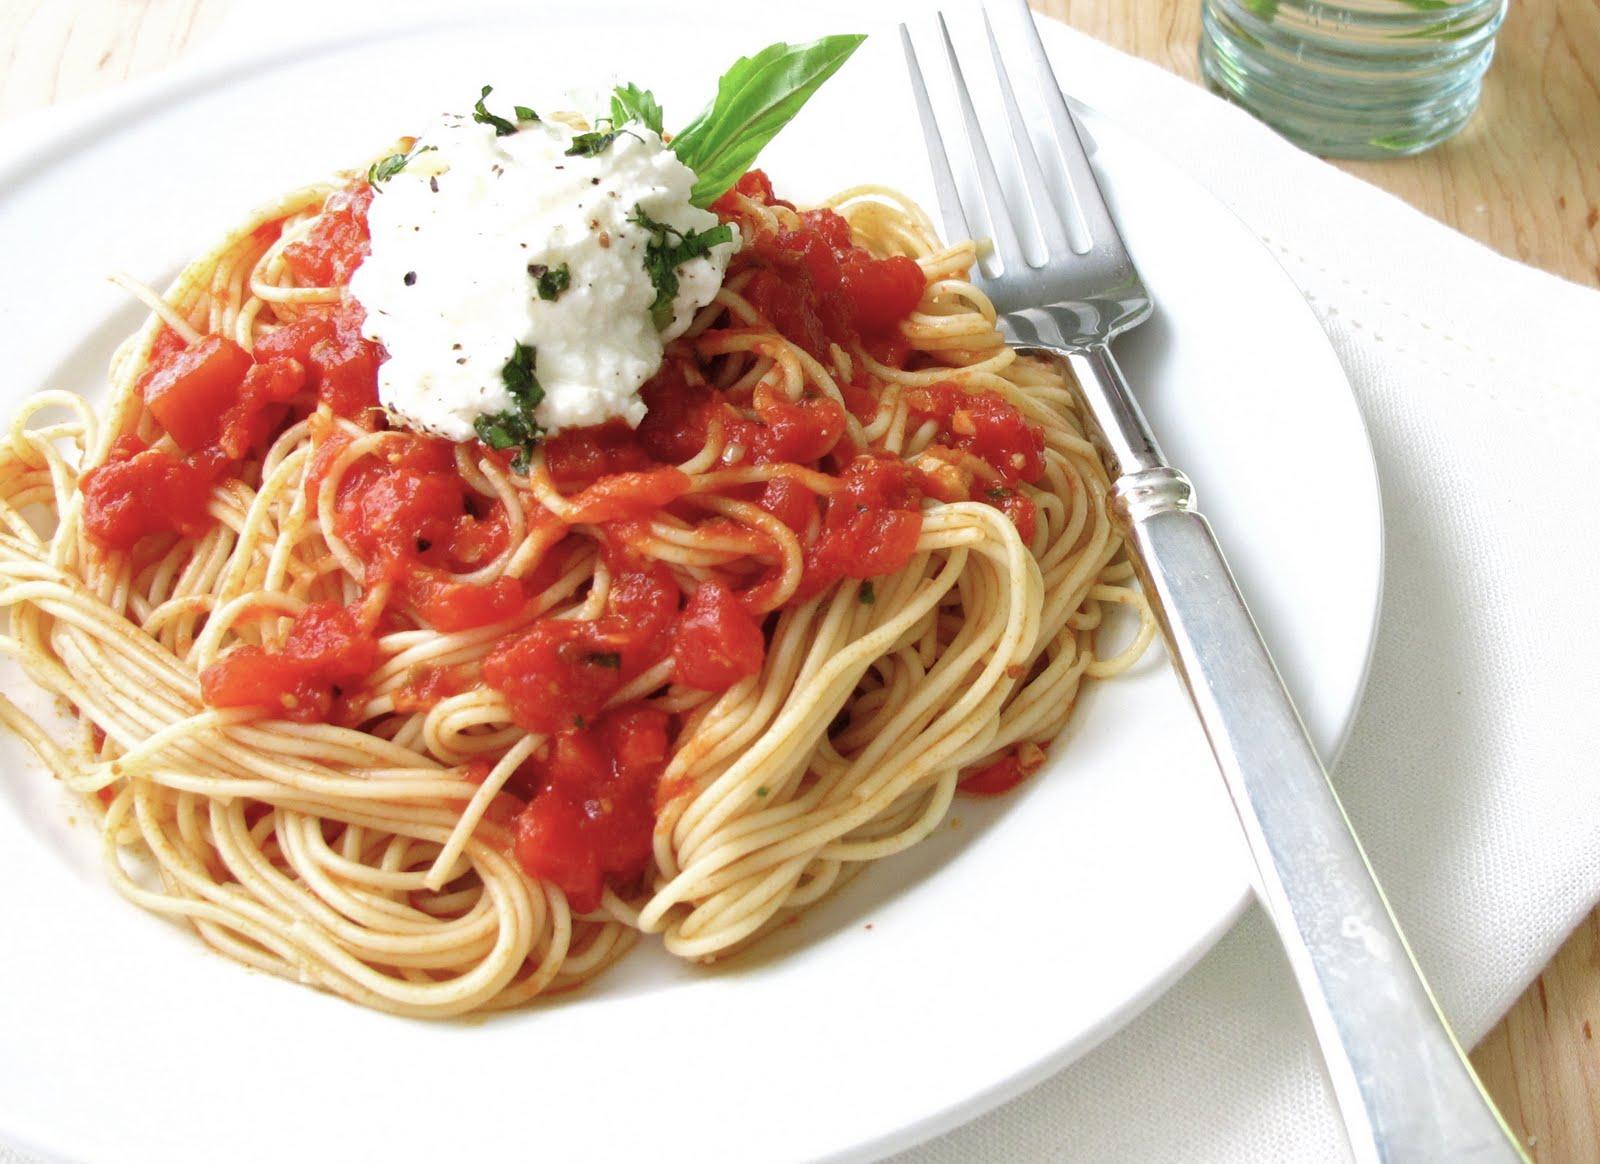 Jenny Steffens Hobick: Tomato Sauce | Simple Tomato Sauce Recipe